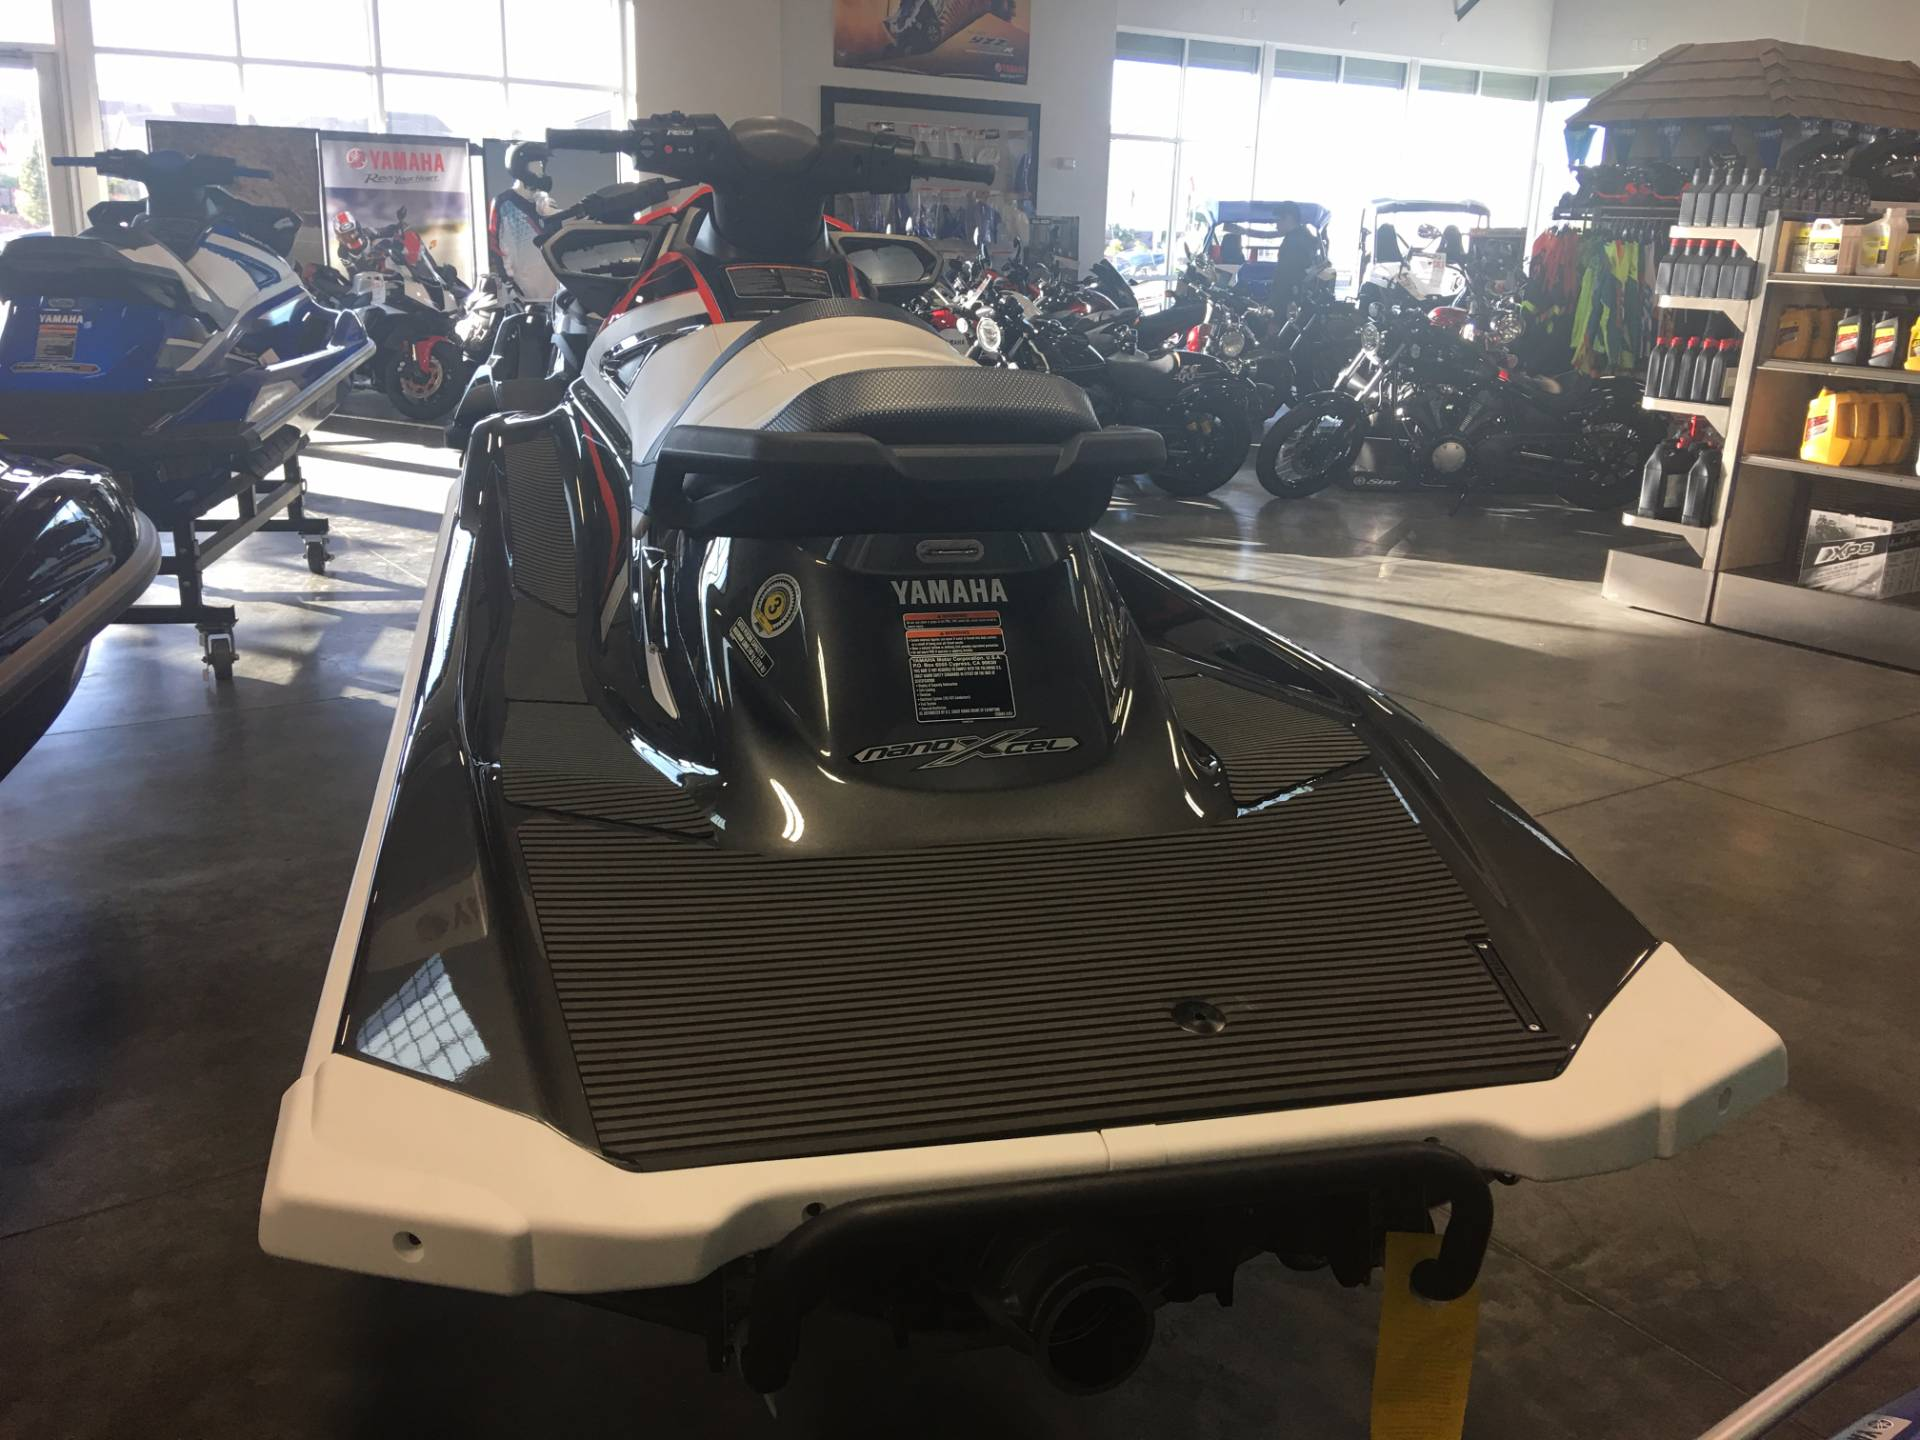 2017 Yamaha VXR in Las Vegas, Nevada